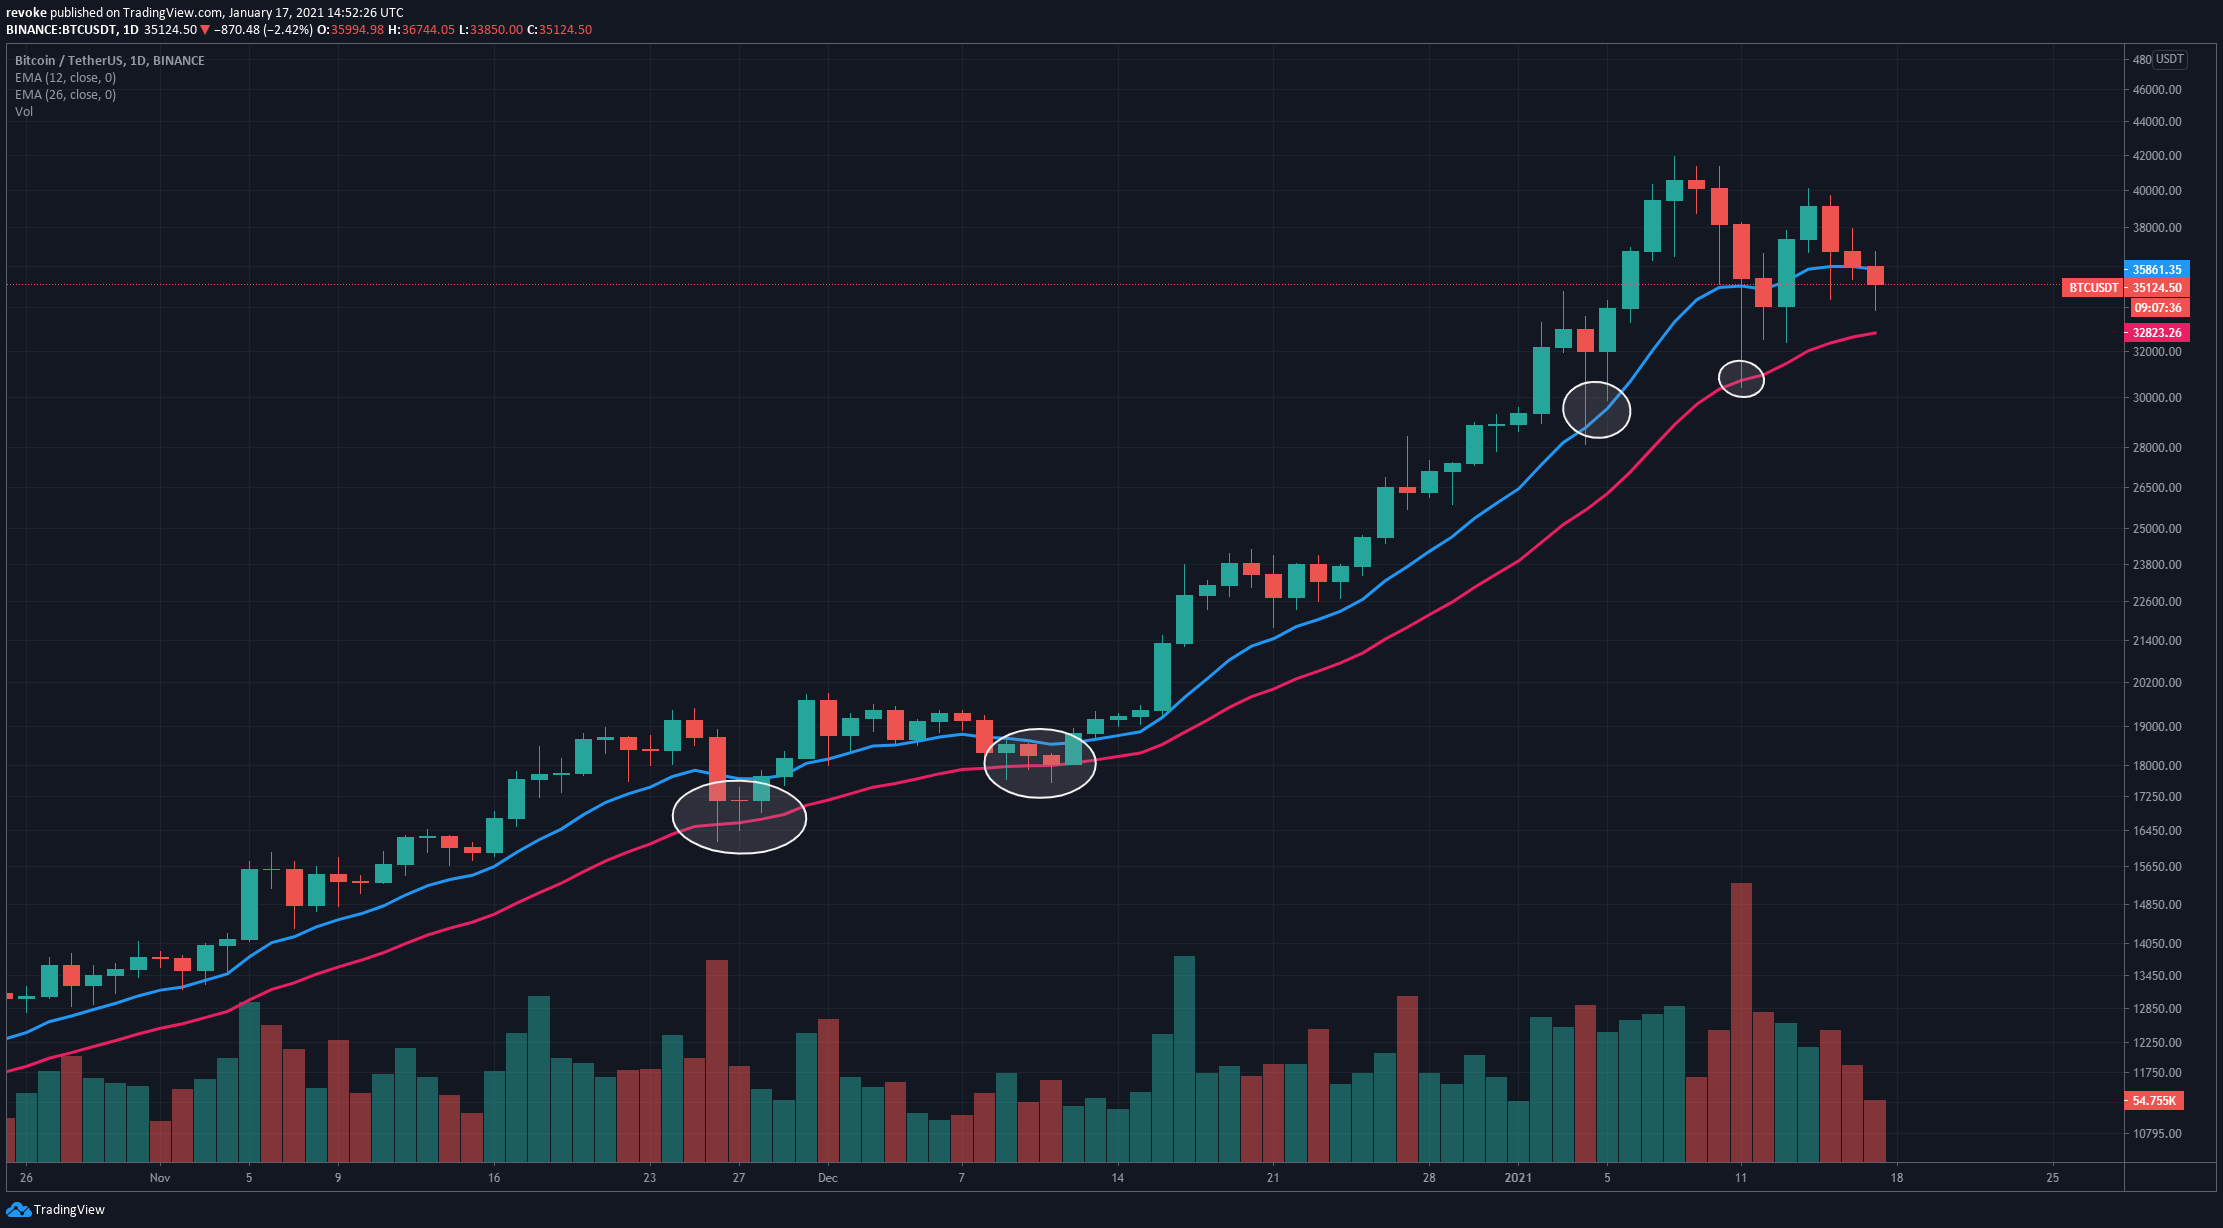 BTC/USD Tages-Chart - TradingView